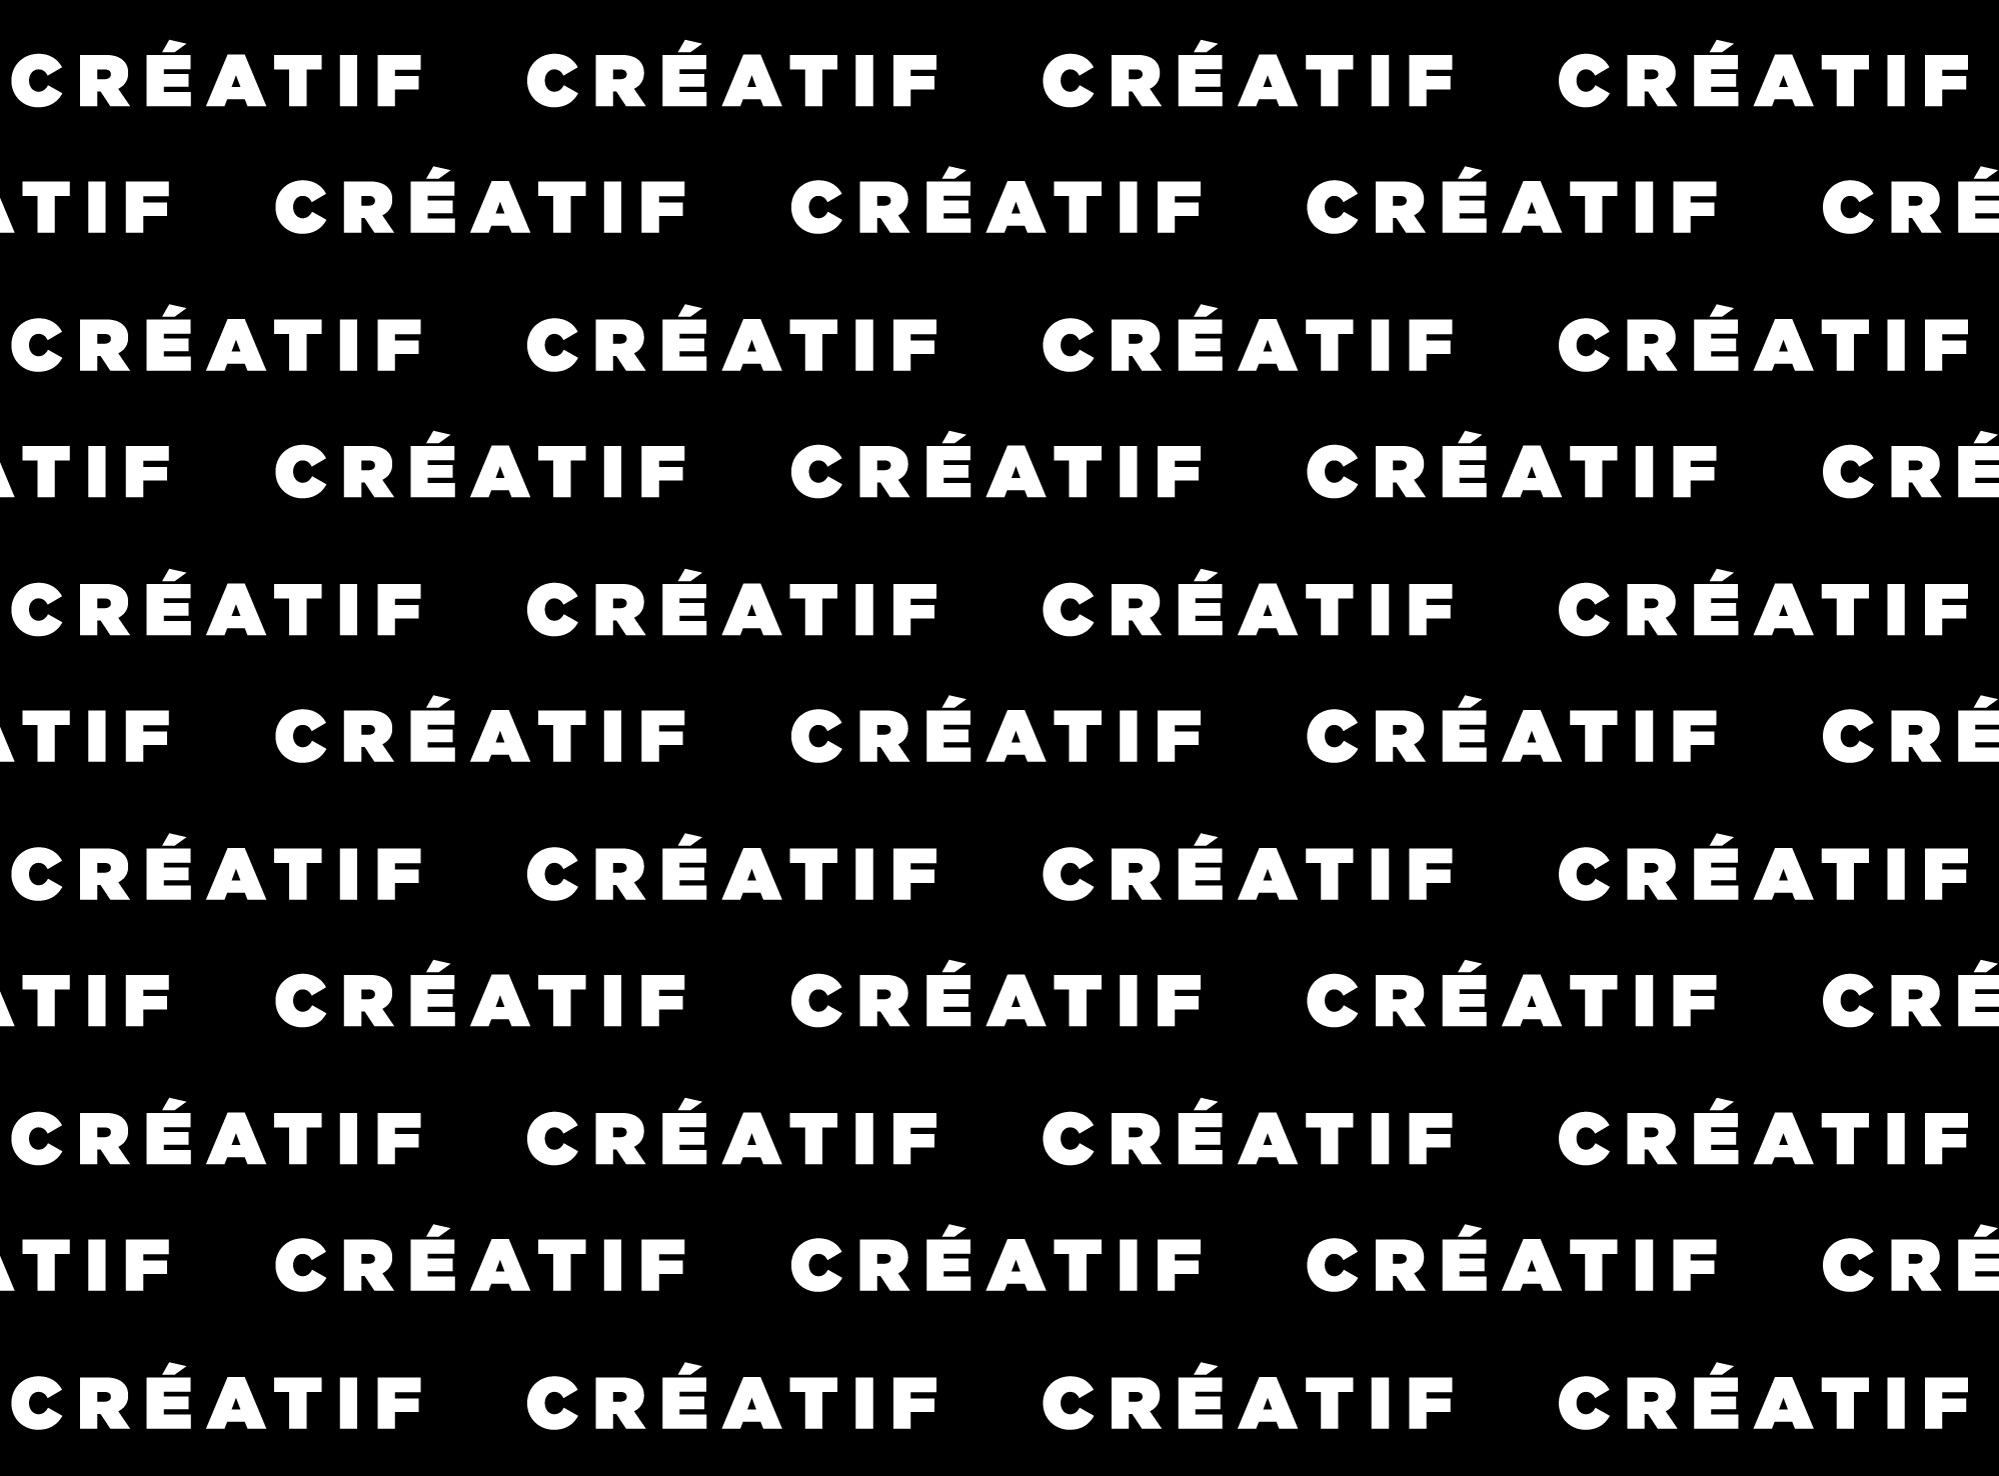 CREATIF-STEPANDREPEAT-2.jpg